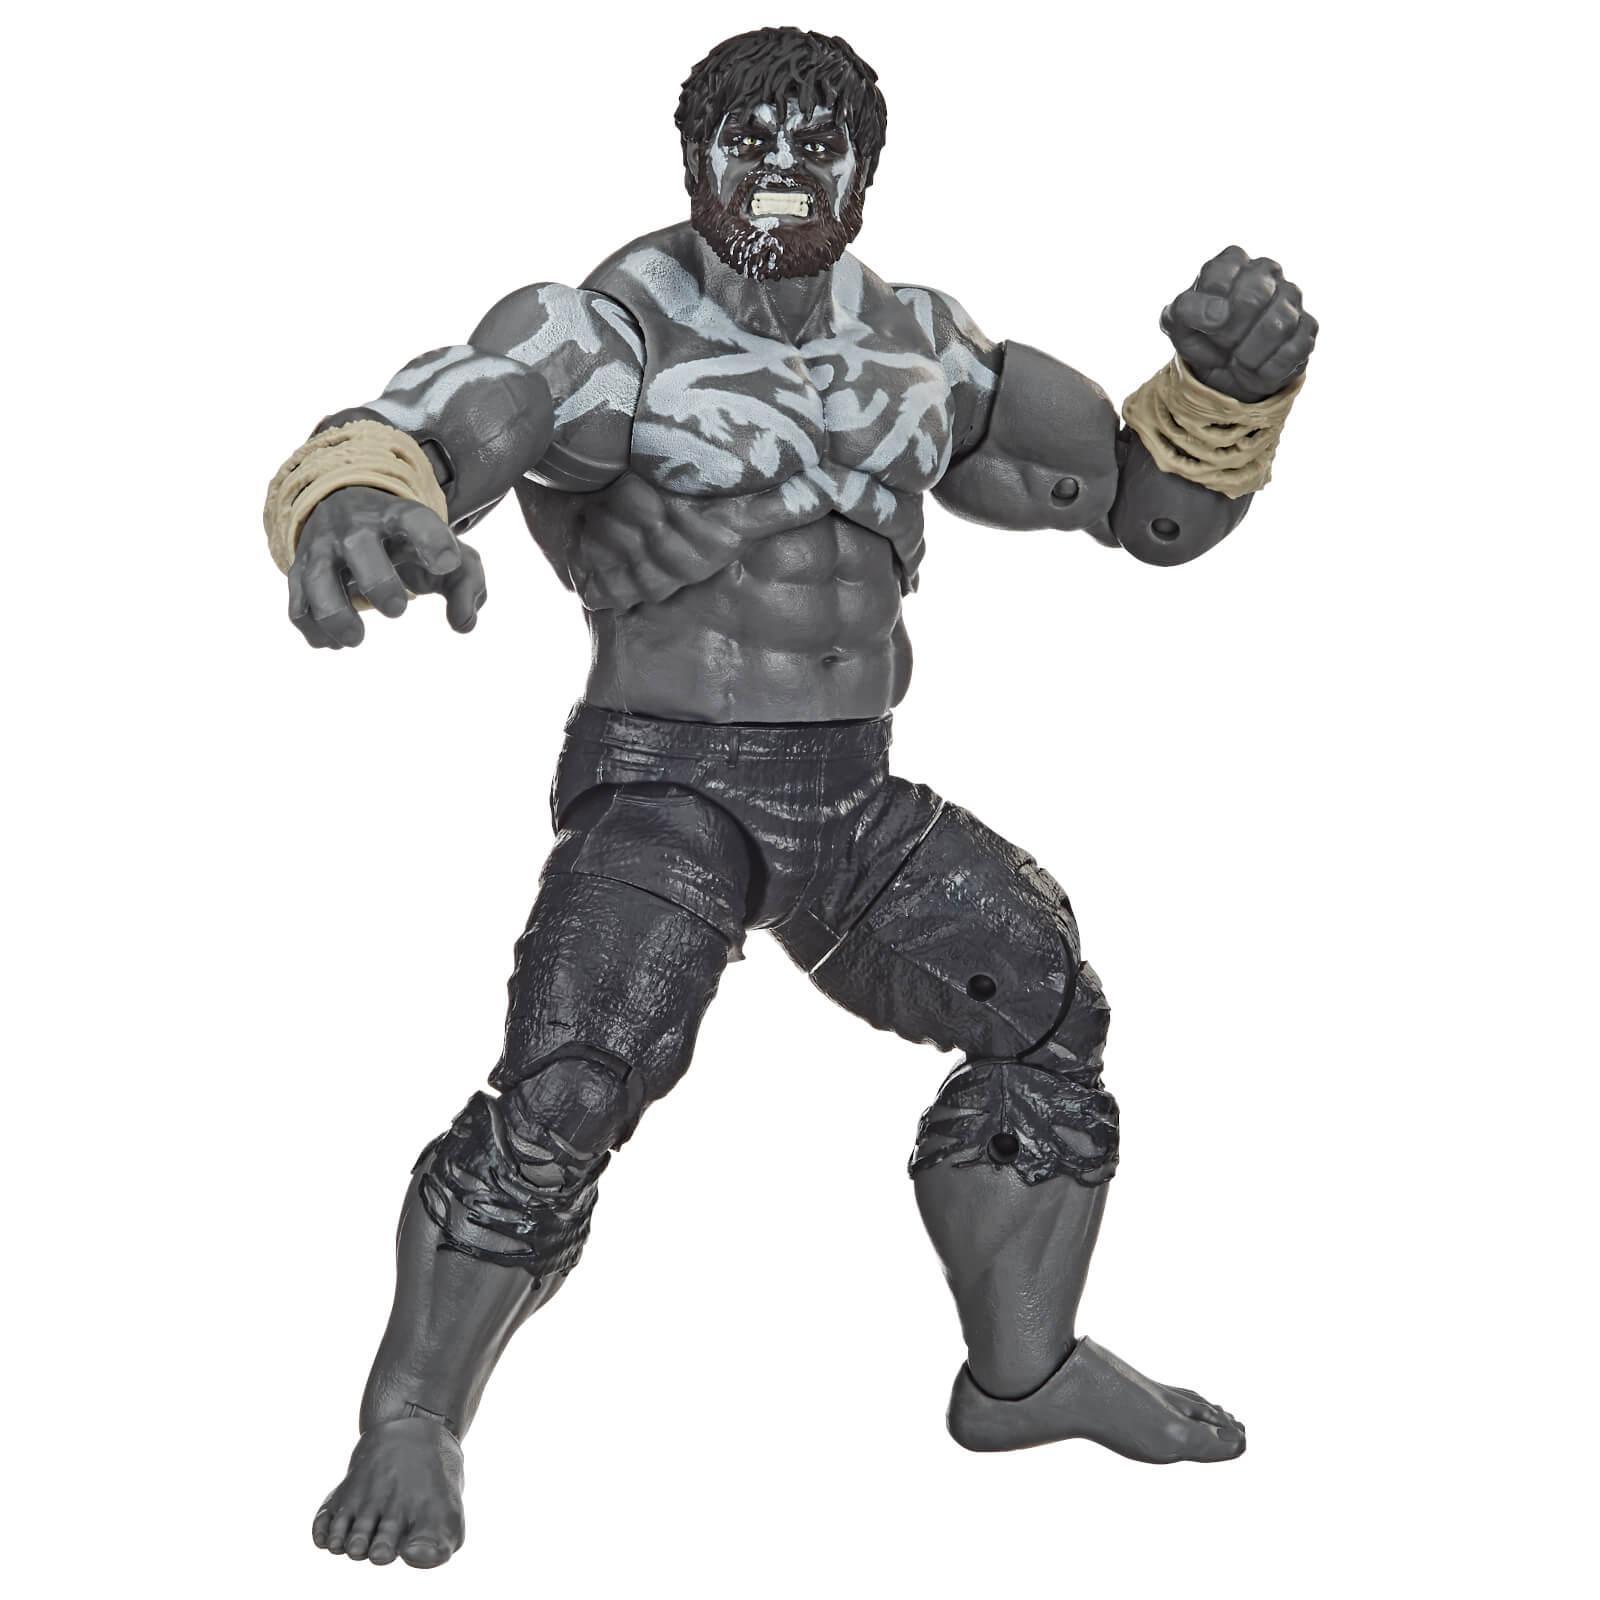 Image of Hasbro Marvel Legends Series 6 Inch Collectible Gamerverse Marvel's Avengers Hulk